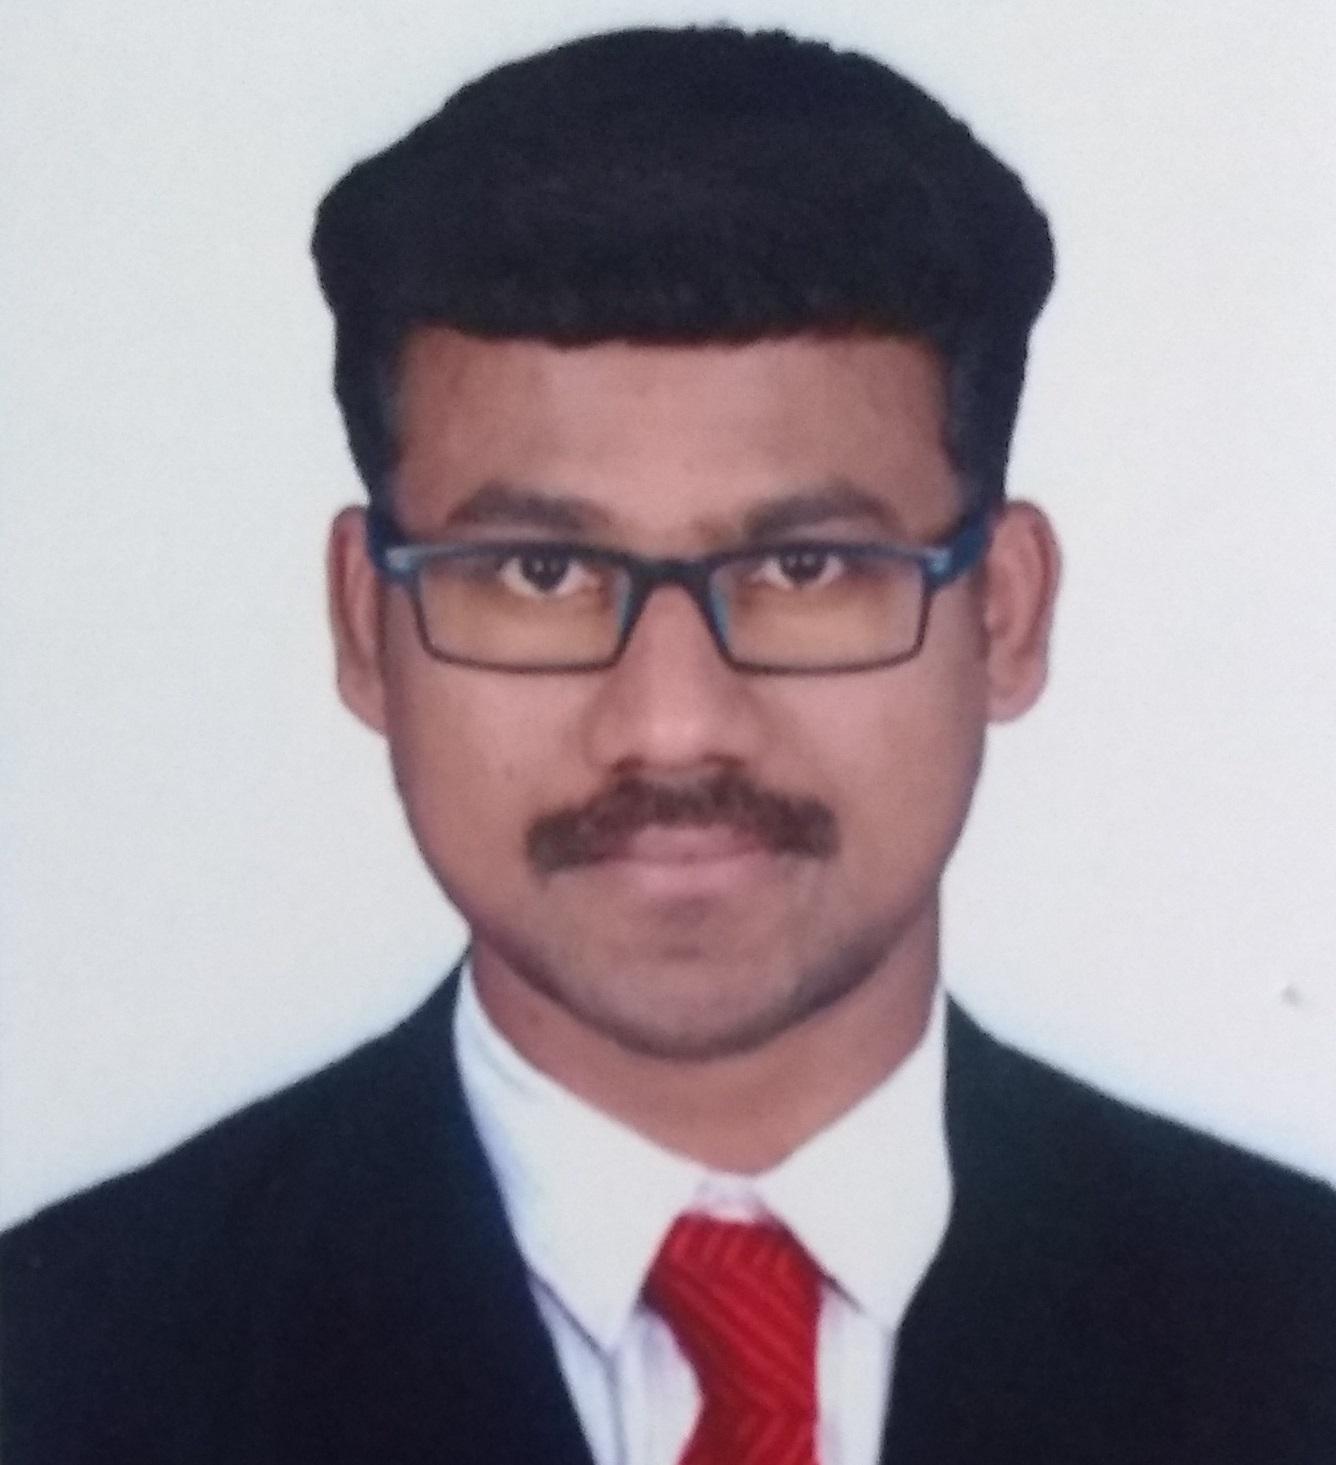 Manimaran.M, Senior Field Application Engineer